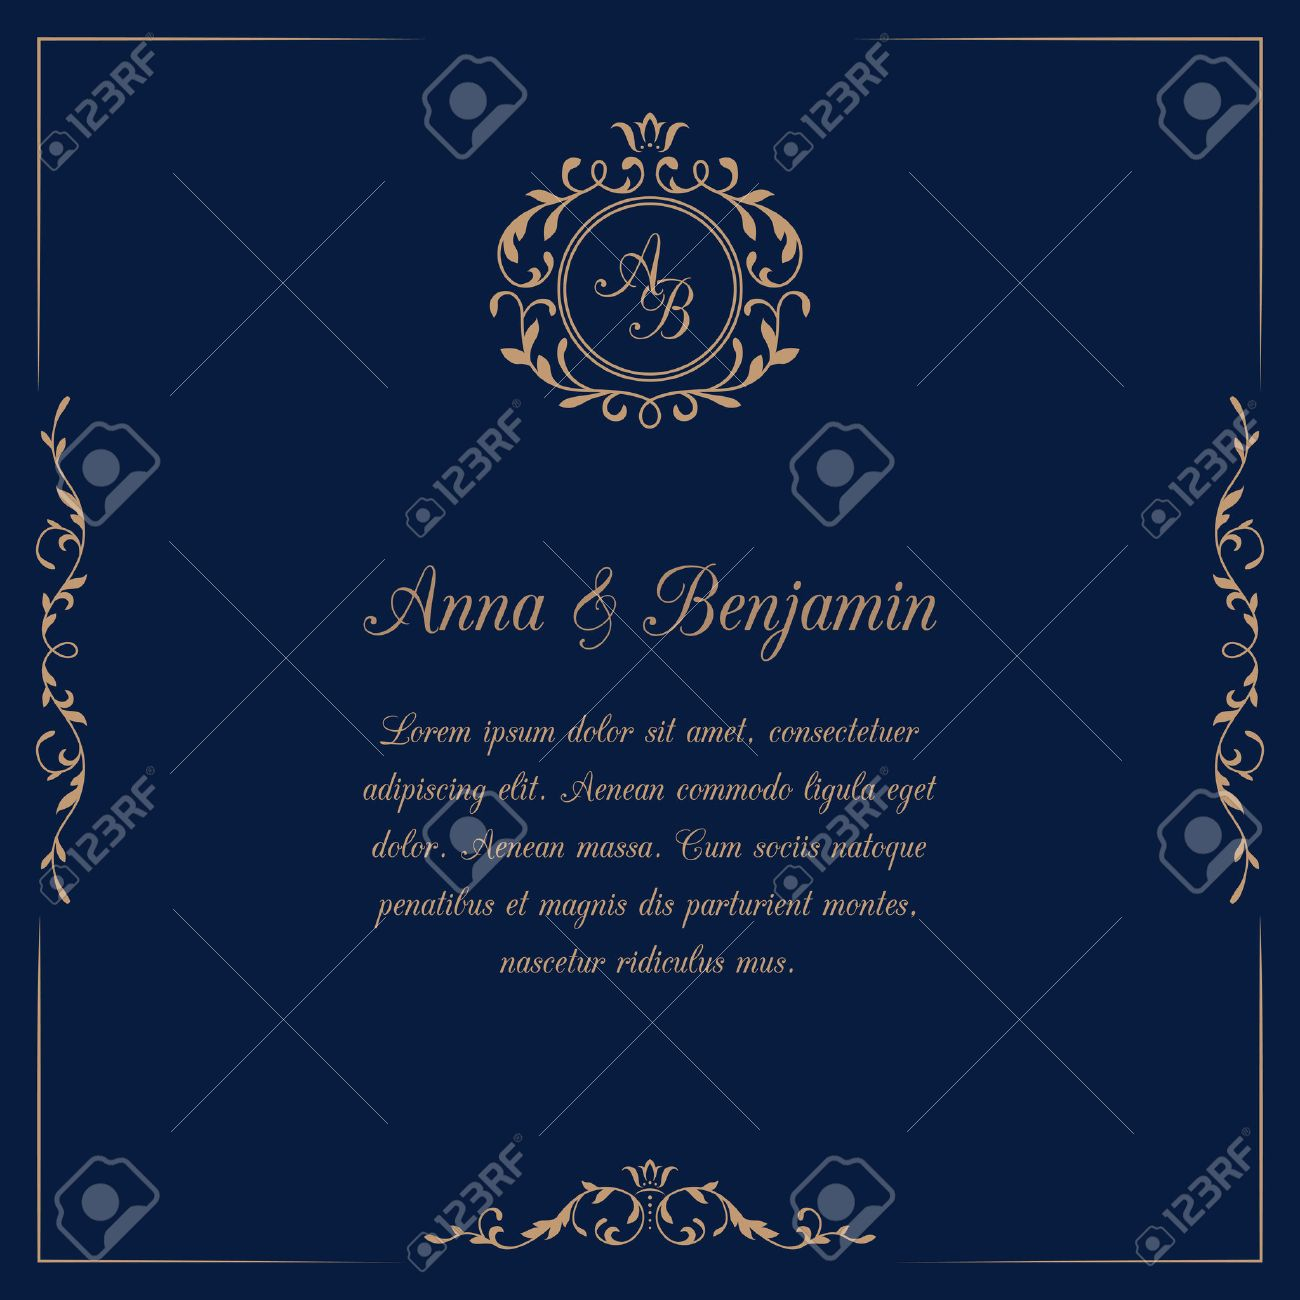 Invitation Card With Monogram On Dark Blue Background Wedding